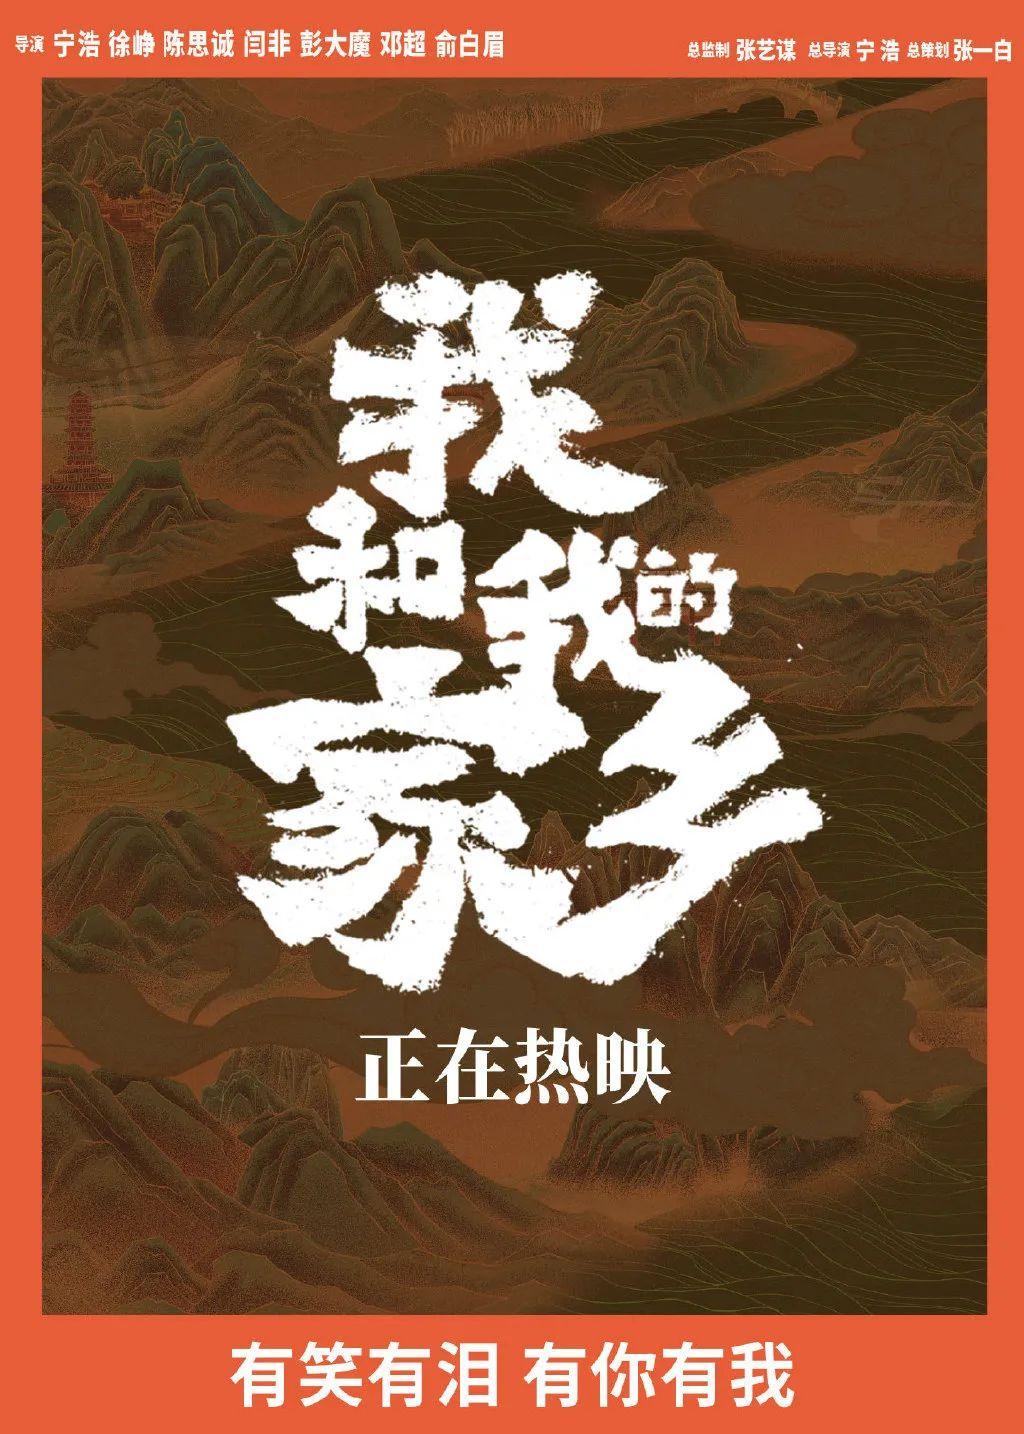 <strong>《我和我的家乡》萧山文化旅游大型亲子</strong>